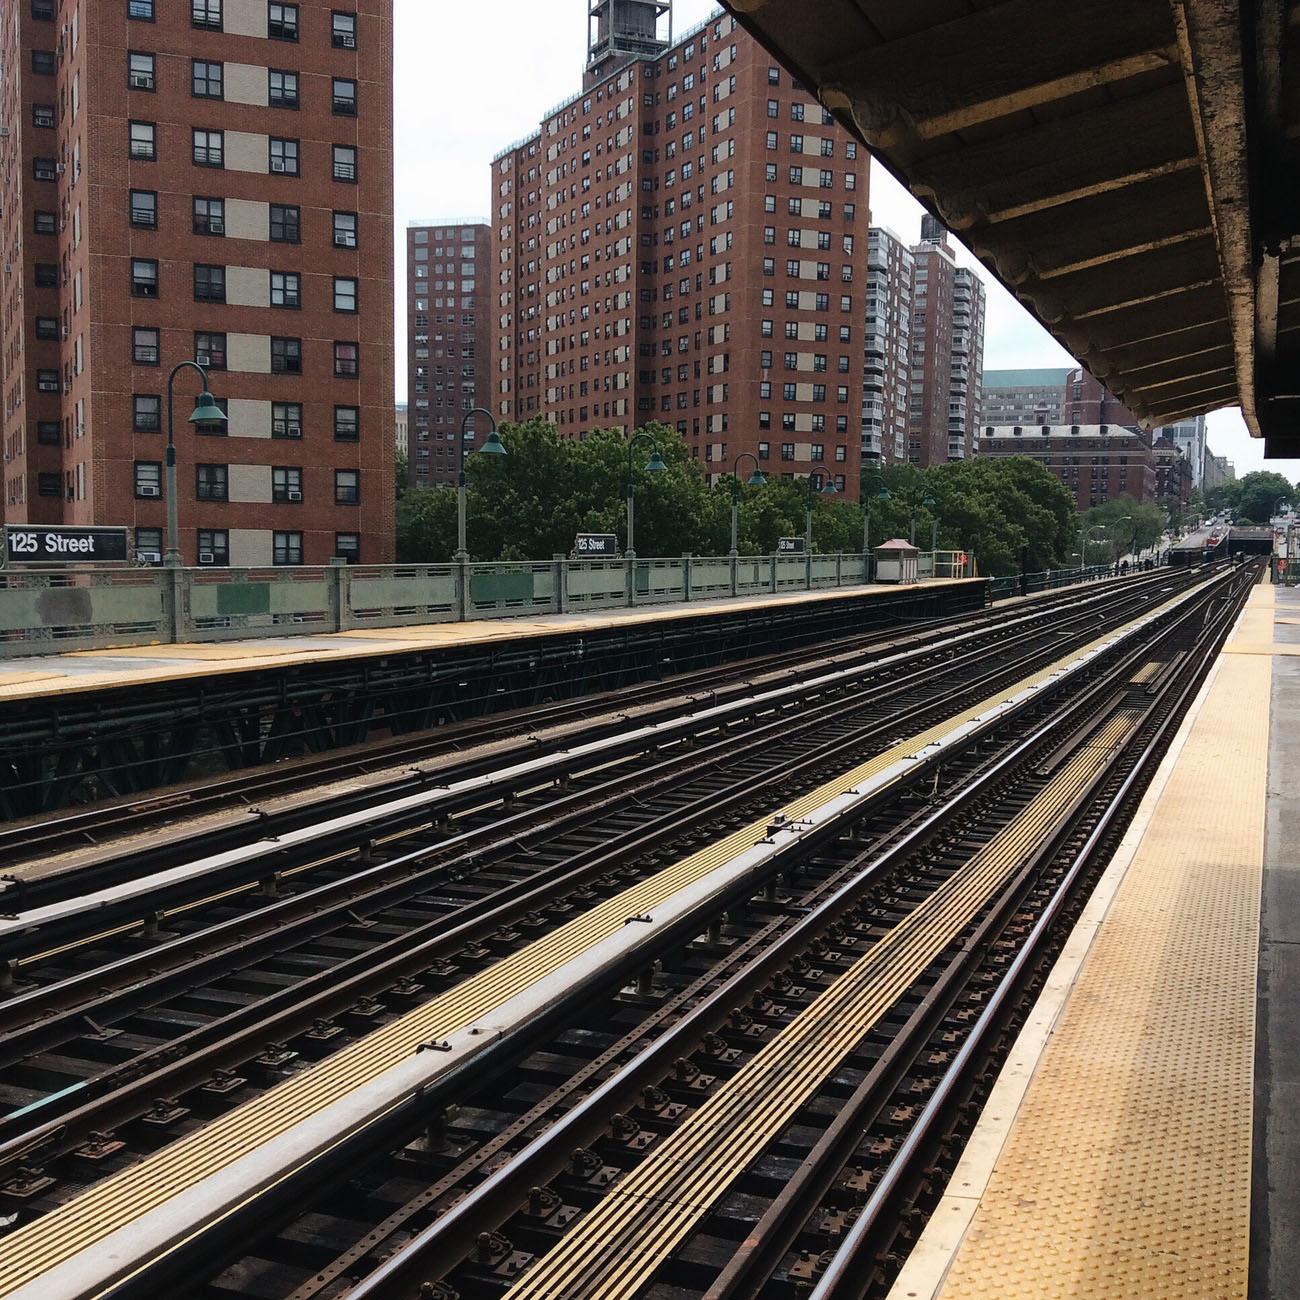 Subway station in Harlem, NYC